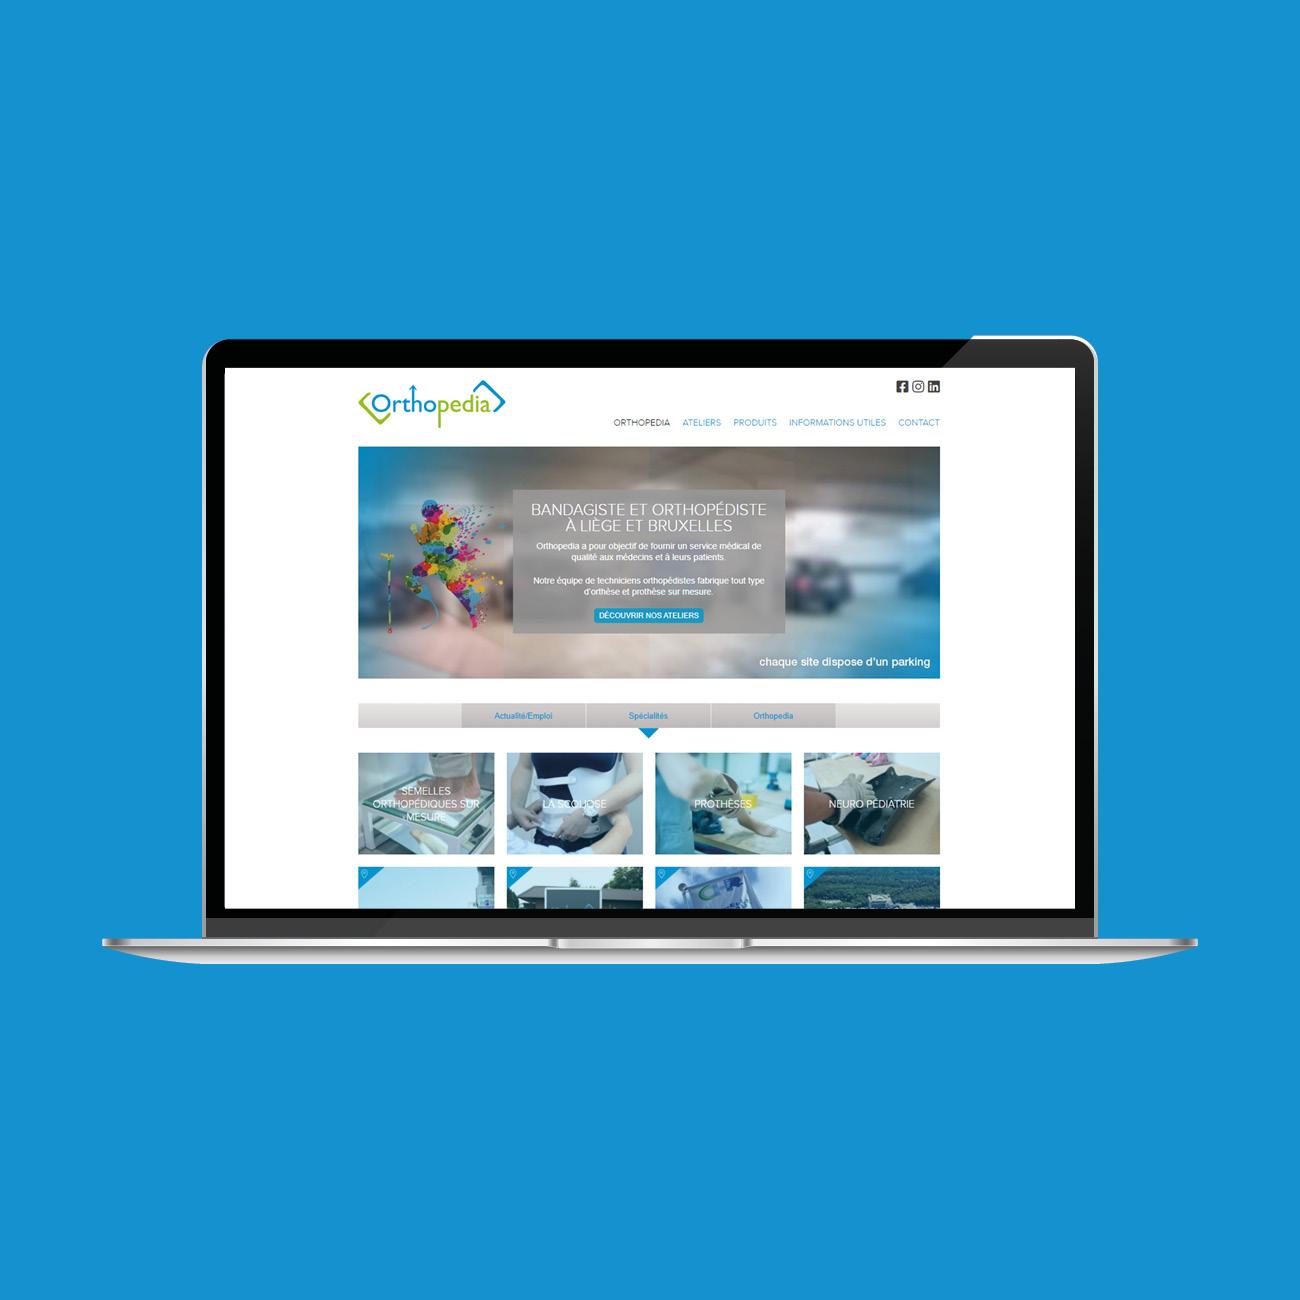 Miko Digital Agence web à Liège - Site Internet pour Orthopedia